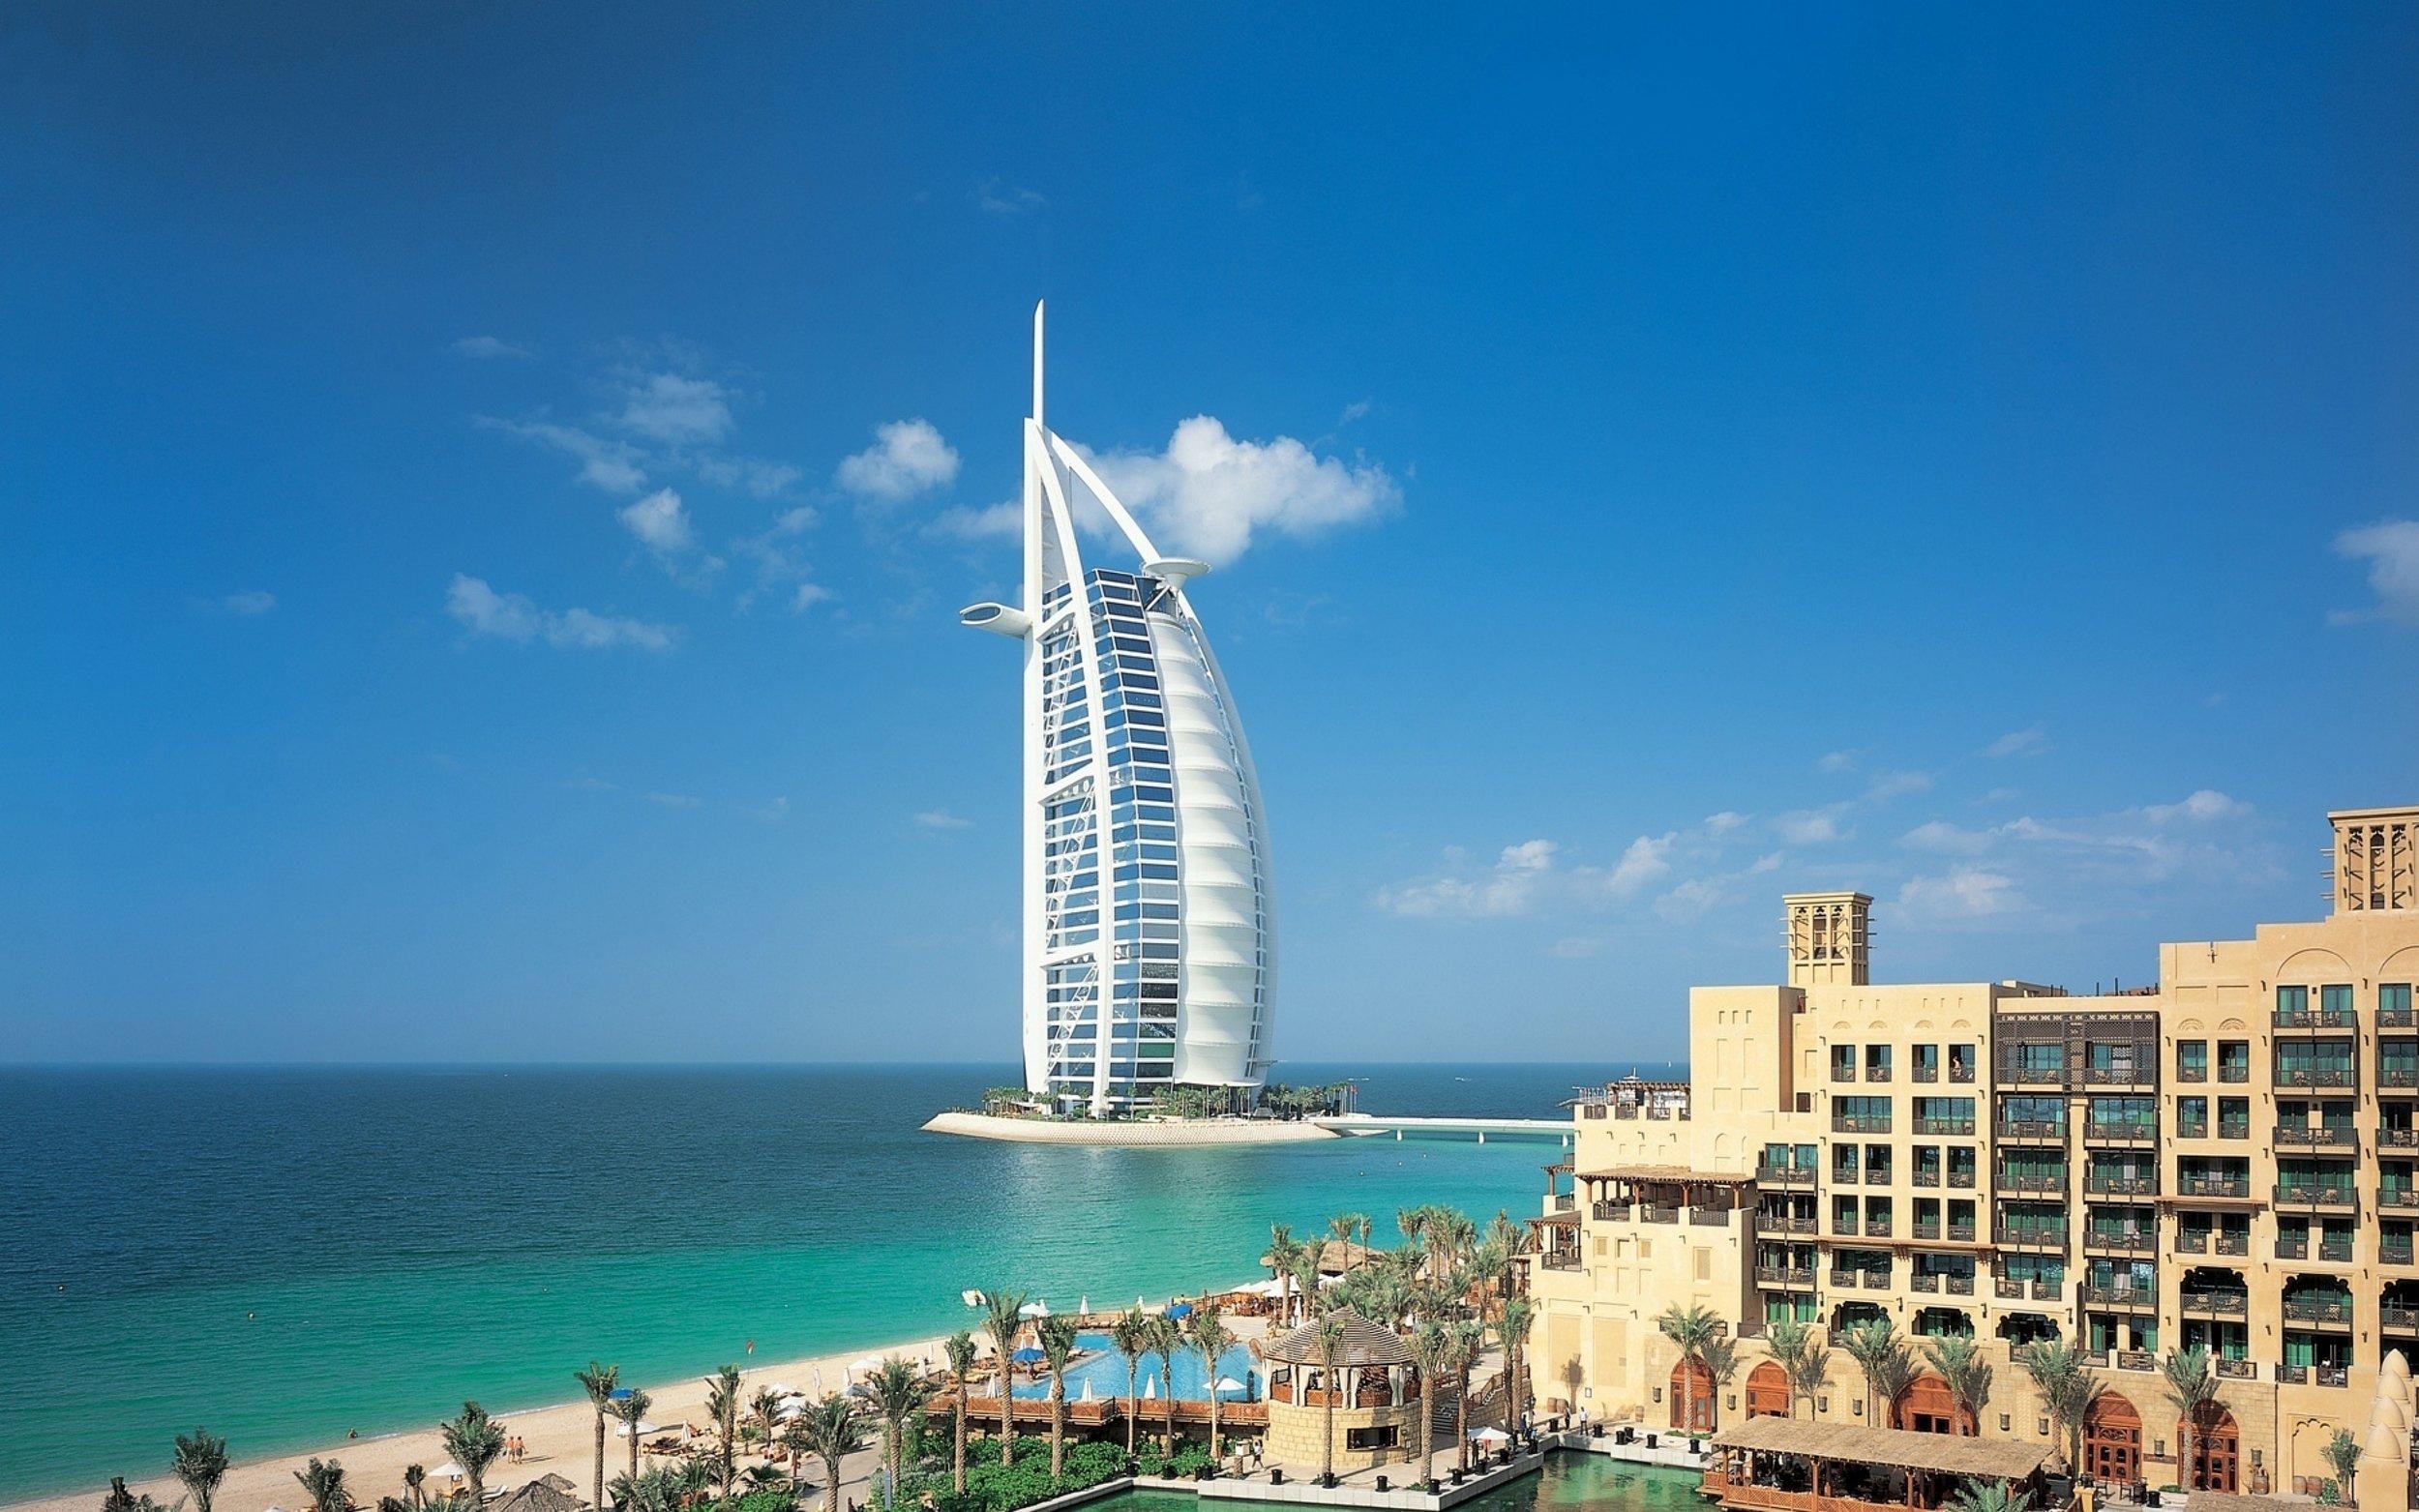 dubai_united_arab_emirates_city_sky_clouds_buildings_sea_river_water_58908_3840x2400.jpg